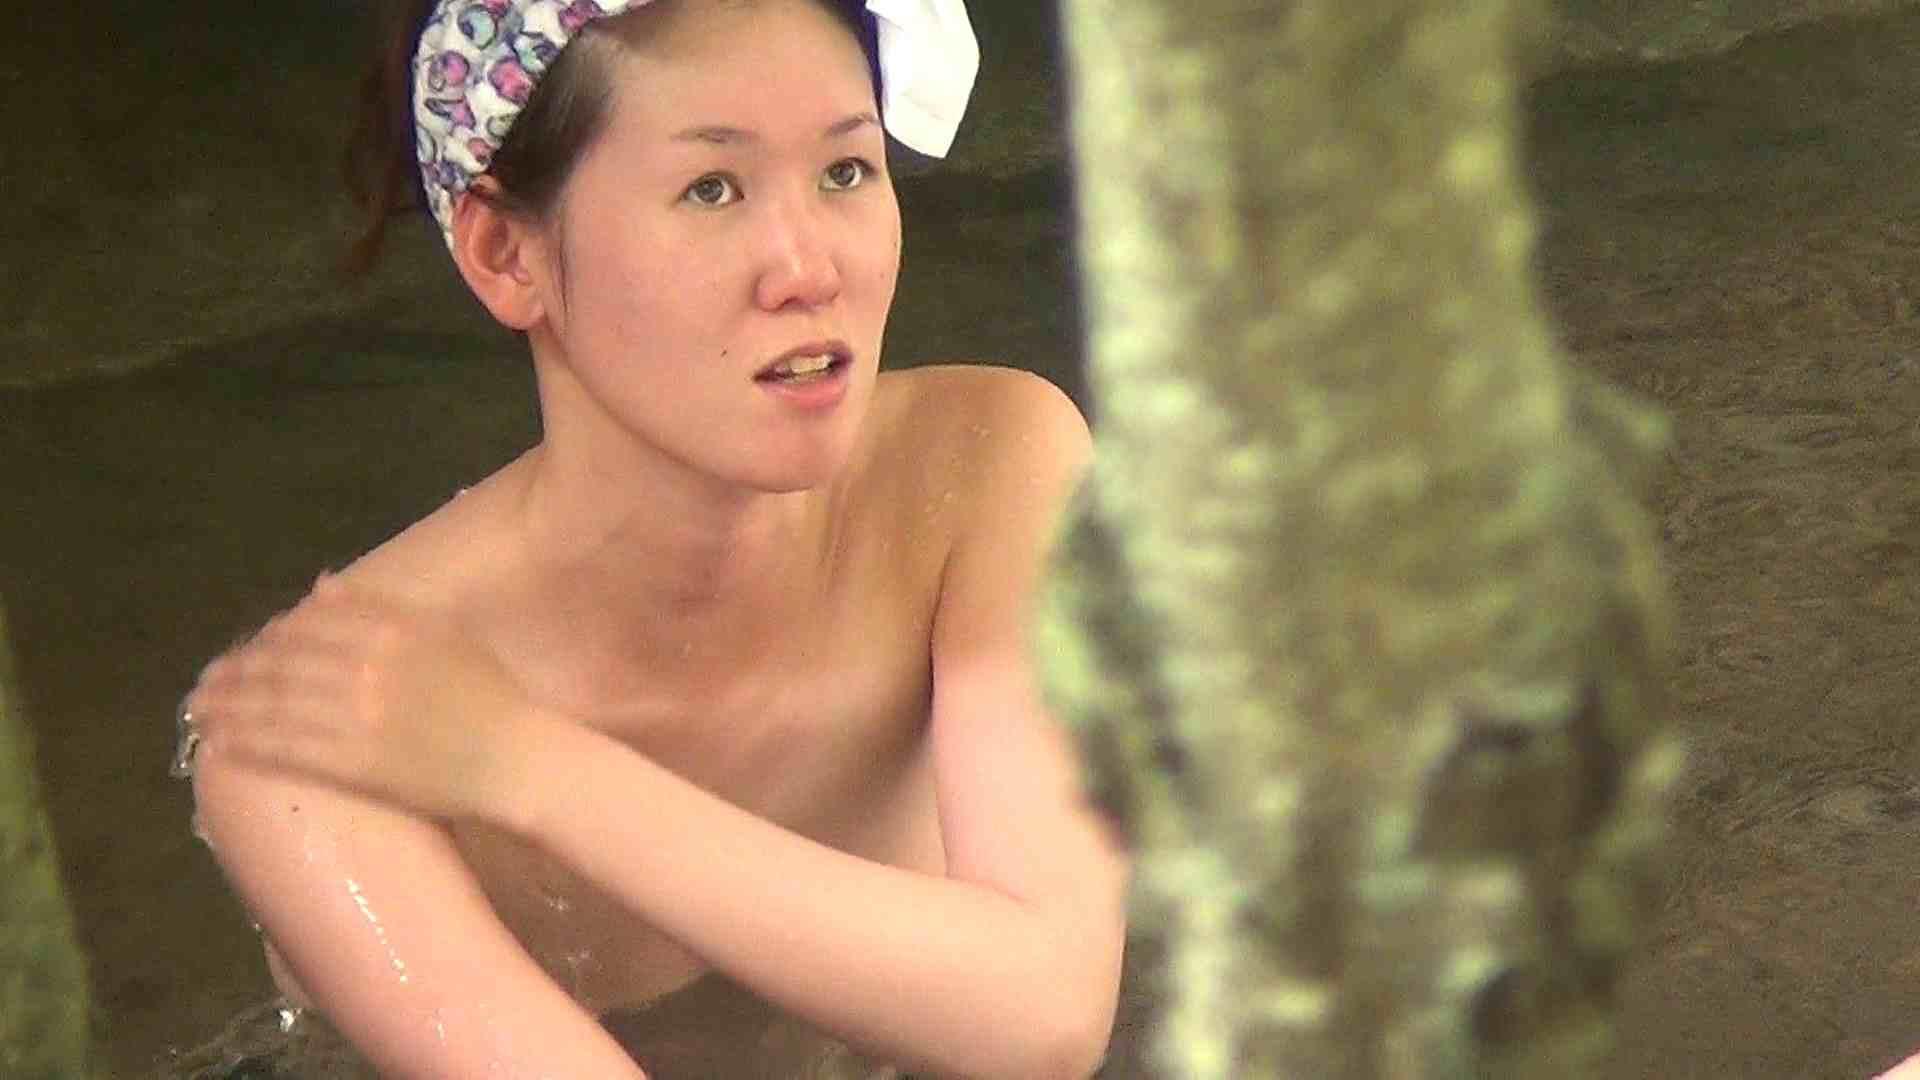 Aquaな露天風呂Vol.245 女体盗撮 | OL女体  46連発 25